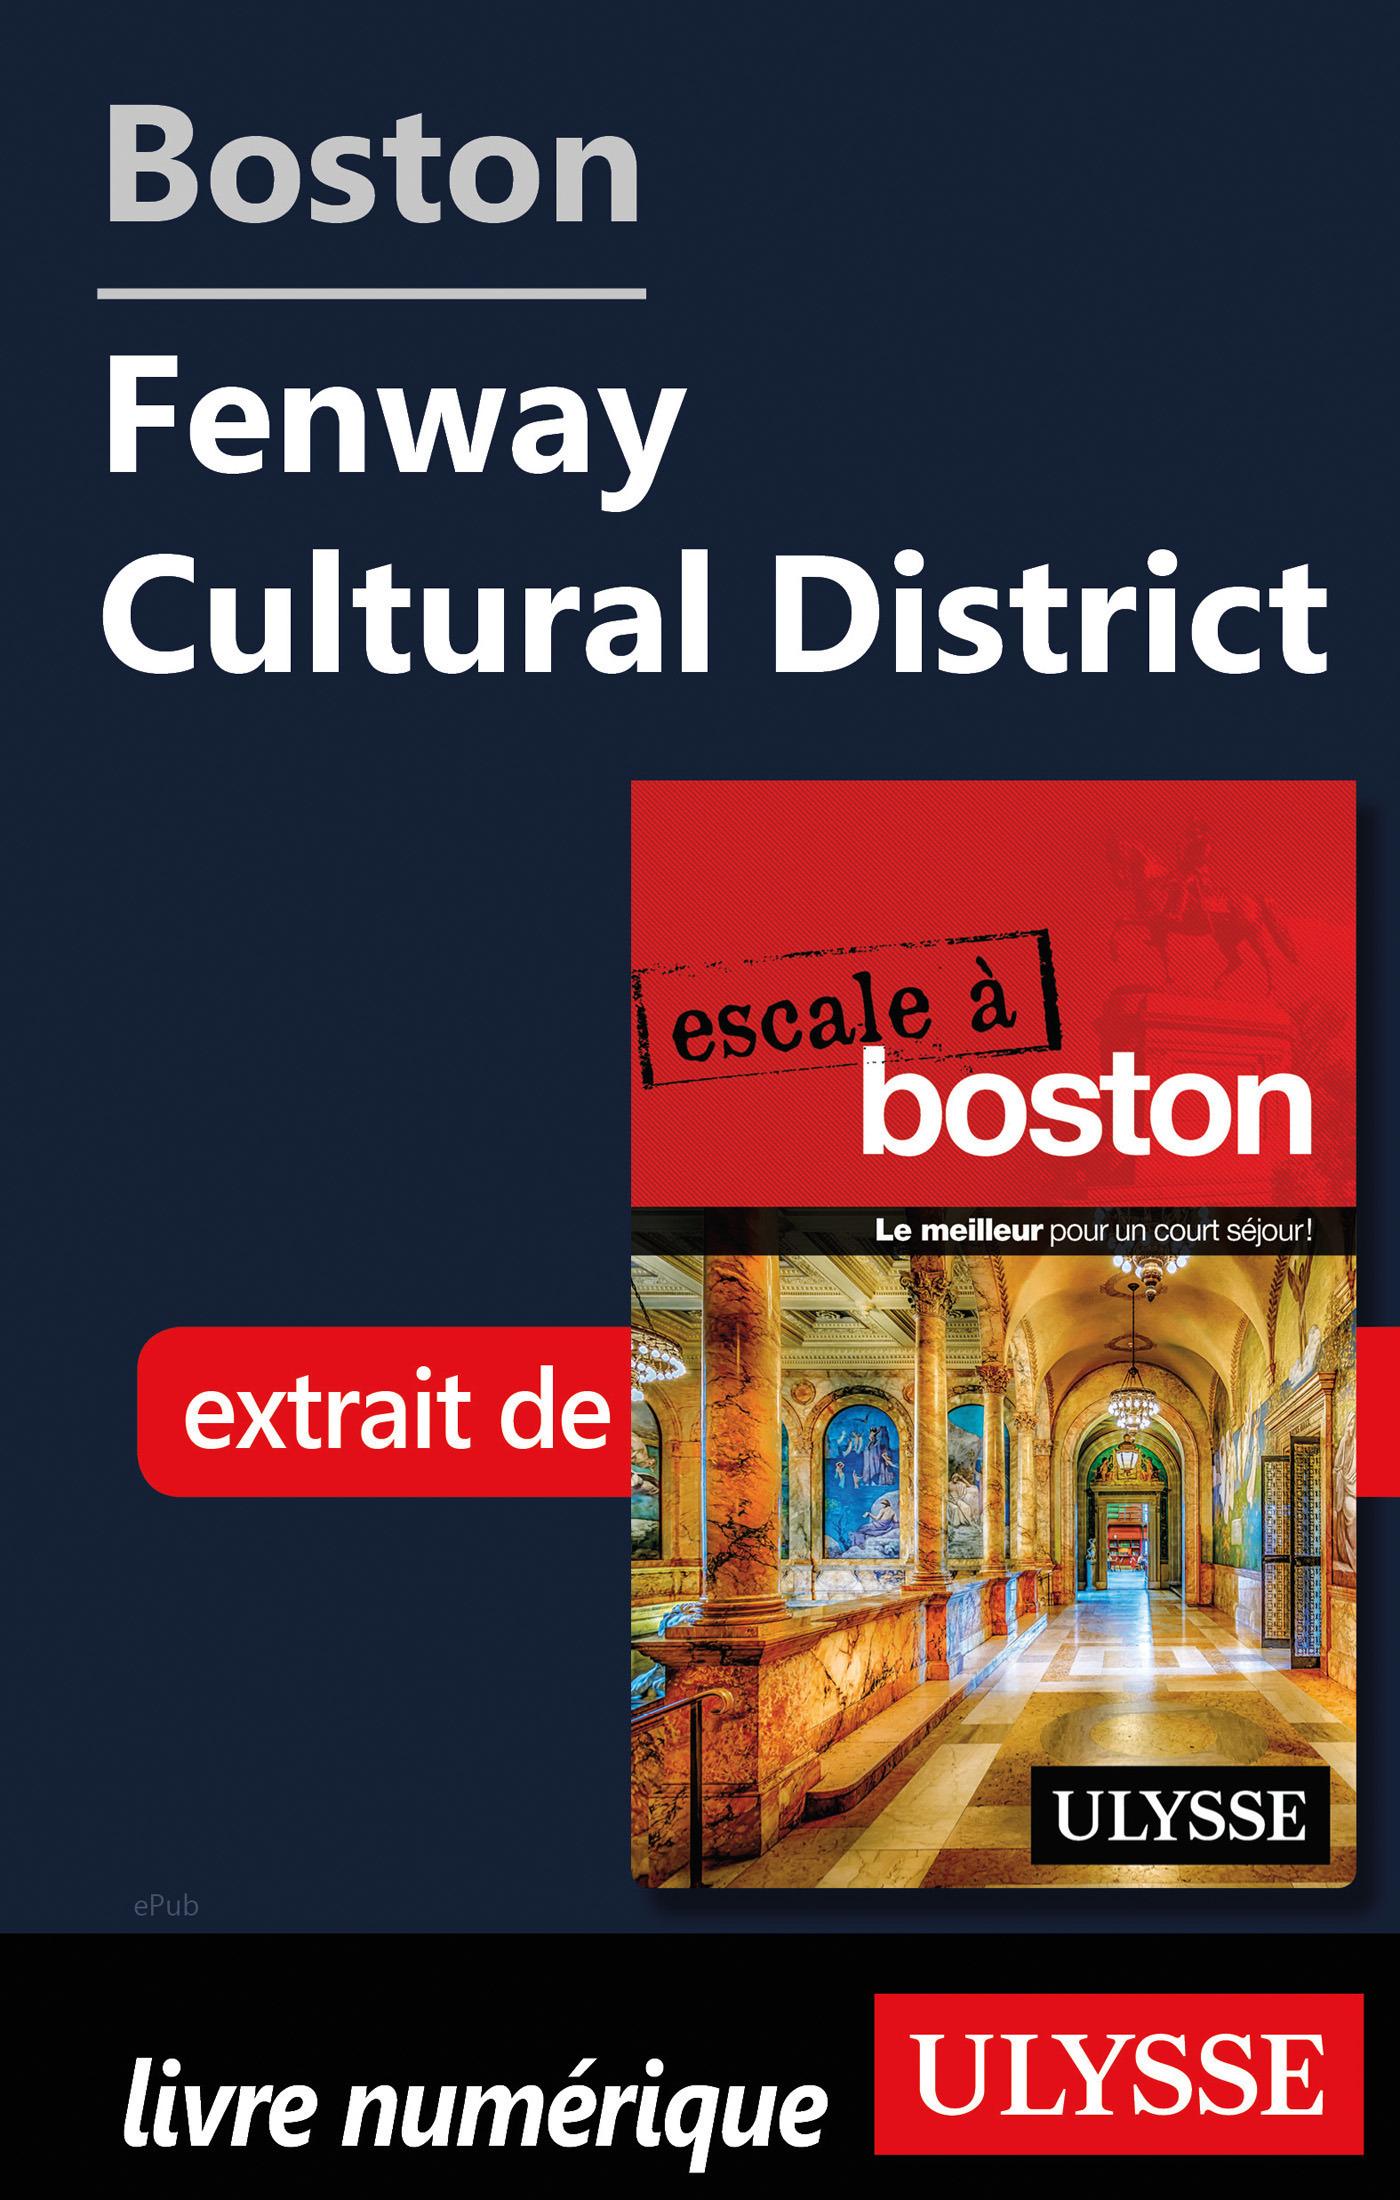 Boston - Fenway Cultural District